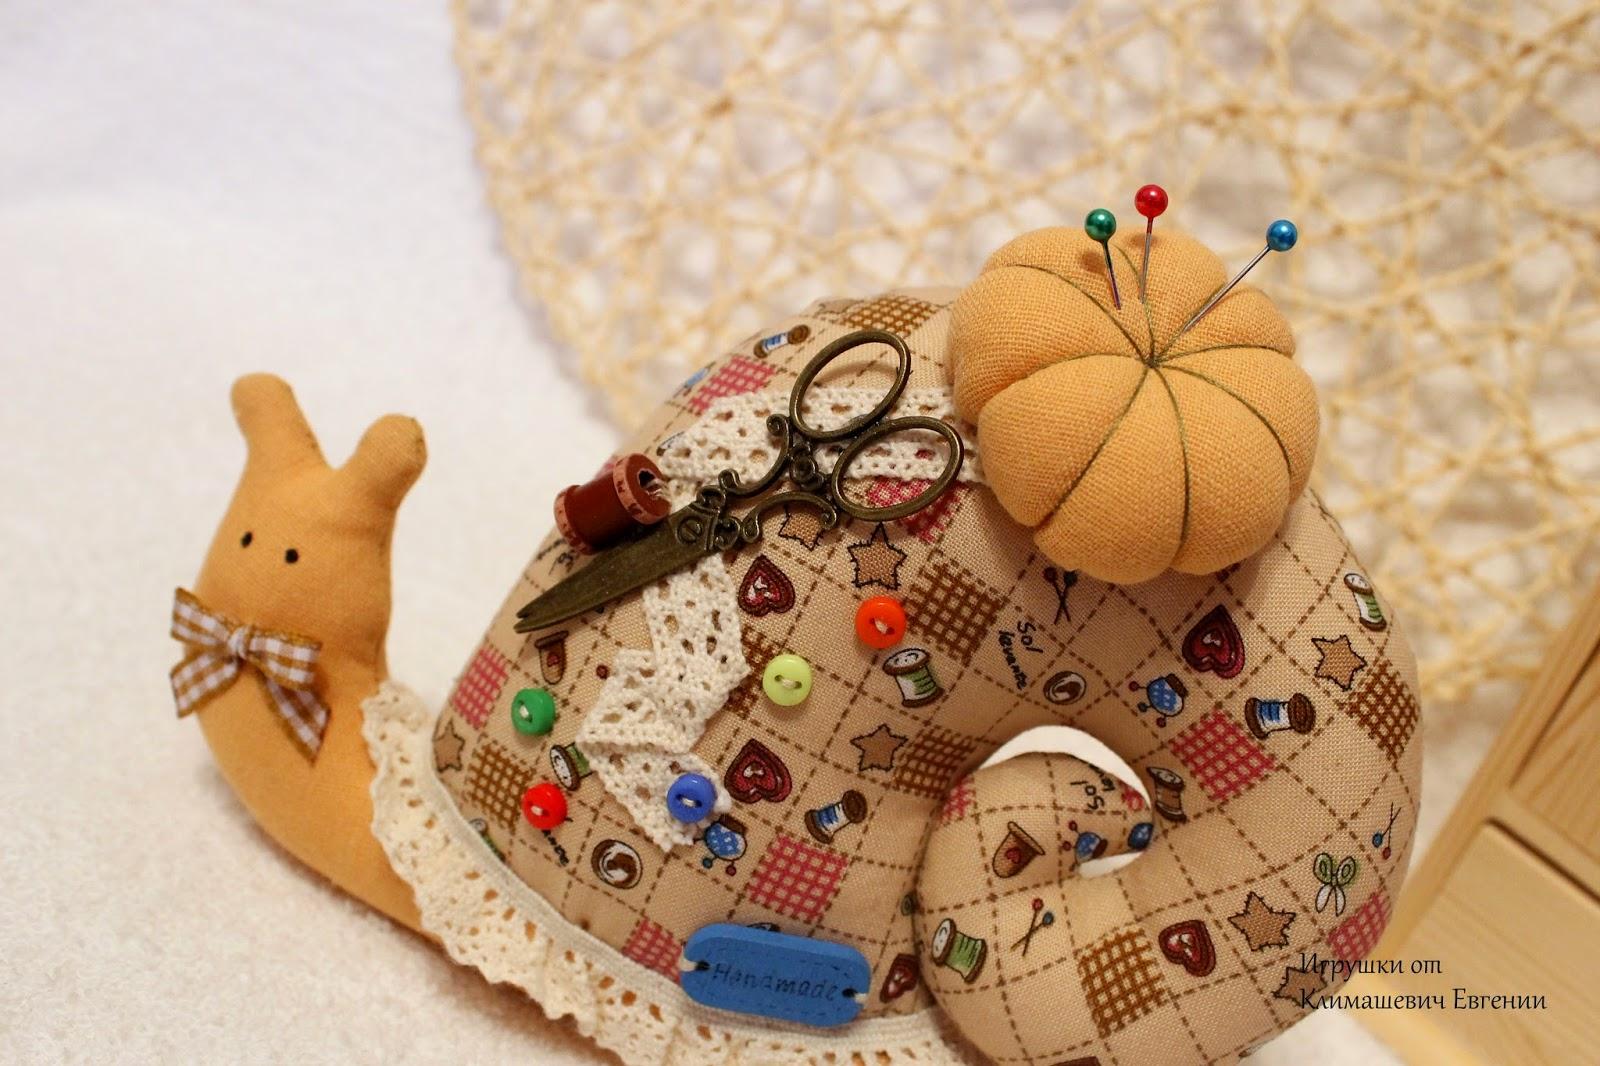 Улитка, тильда улитка, тильда, игрушка улитка, игрушка тильда, игрушка, интерьерная игрушка, купить игрушку